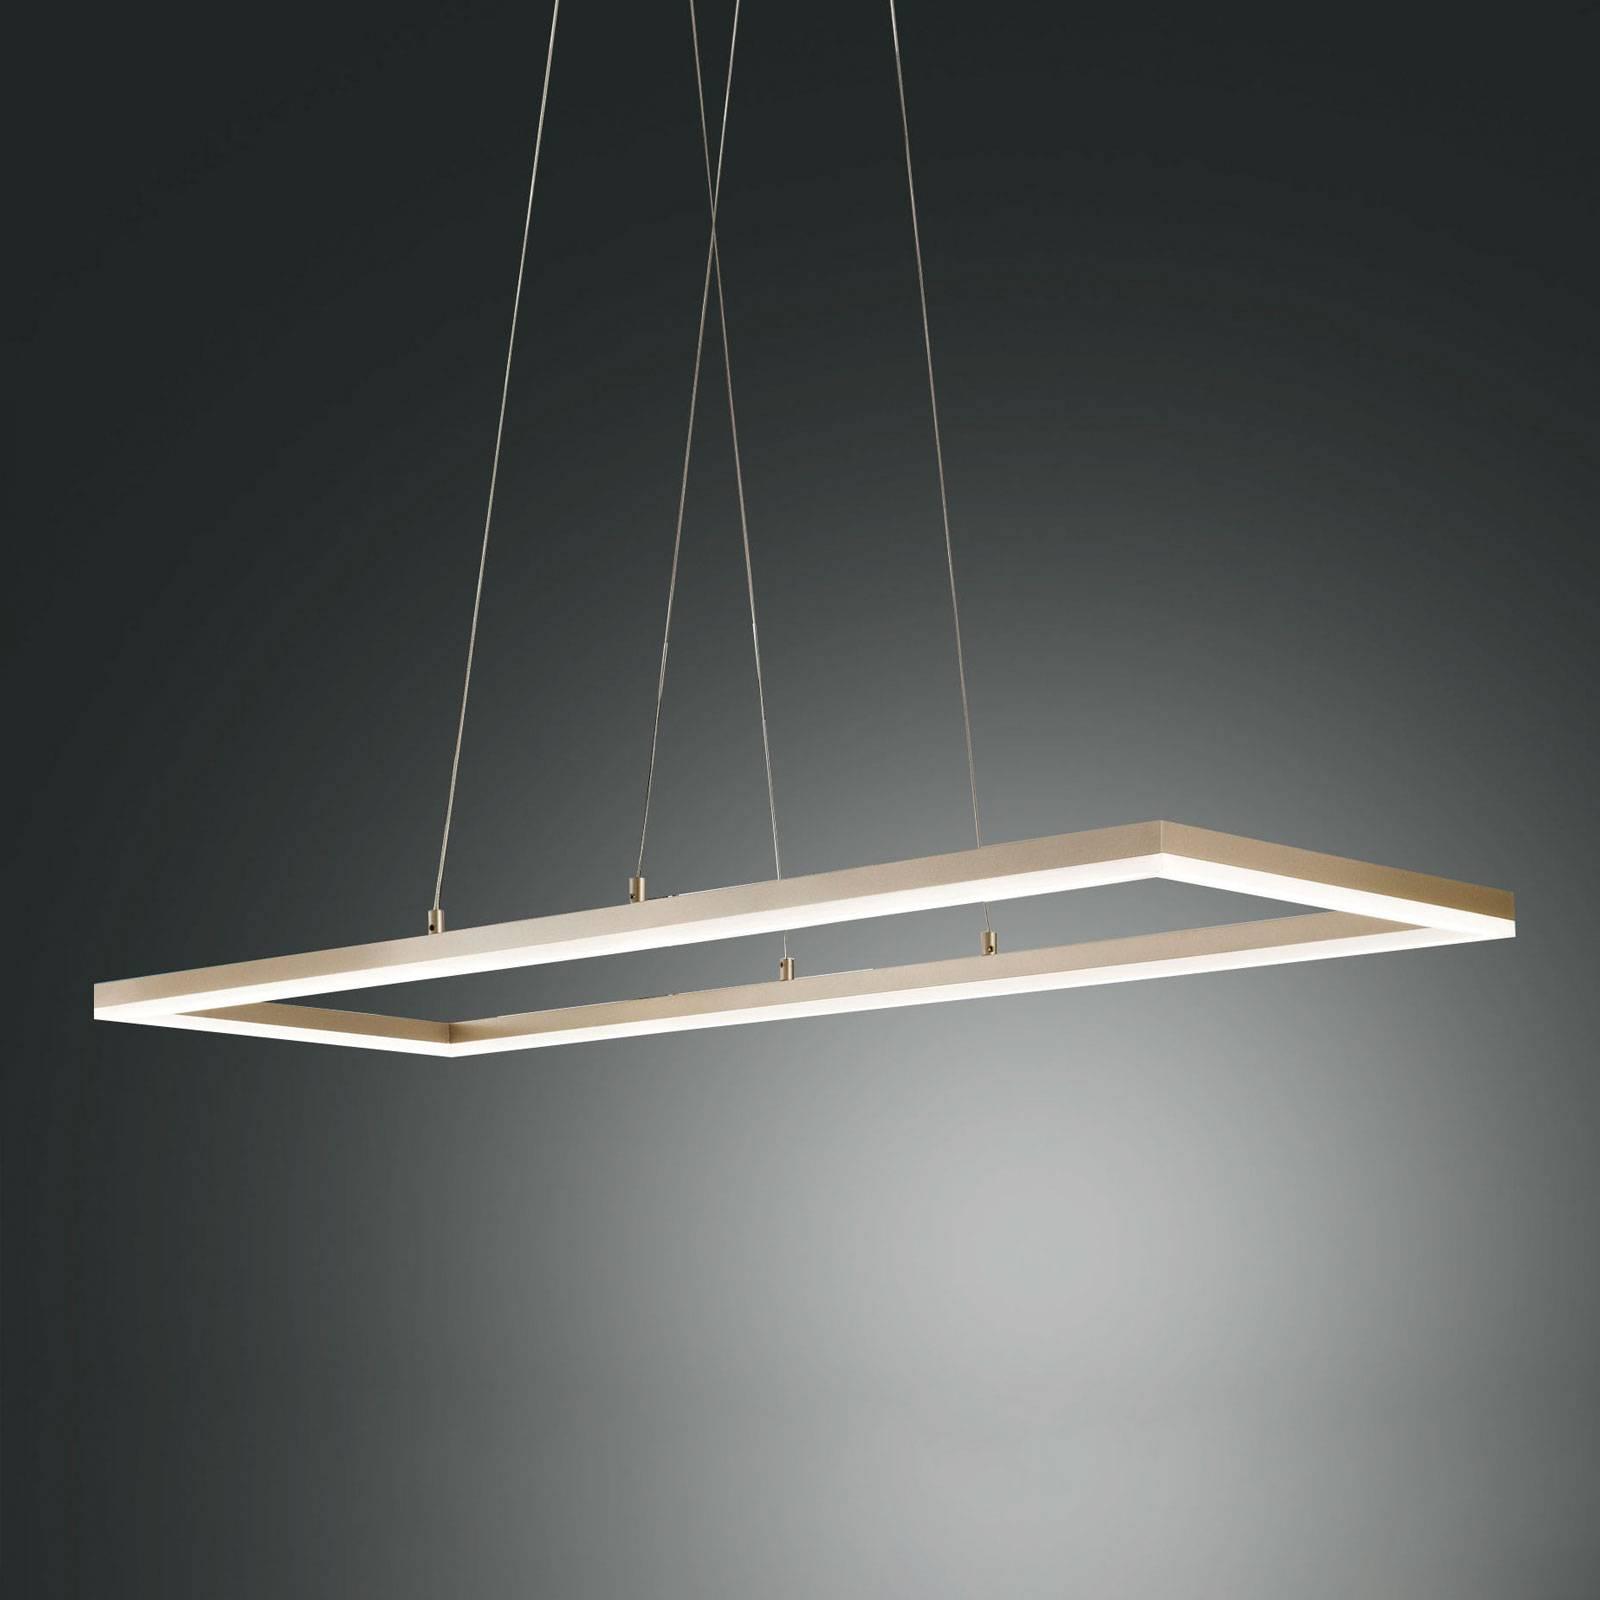 LED hanglamp Bard, 92x32cm in matgoud finish